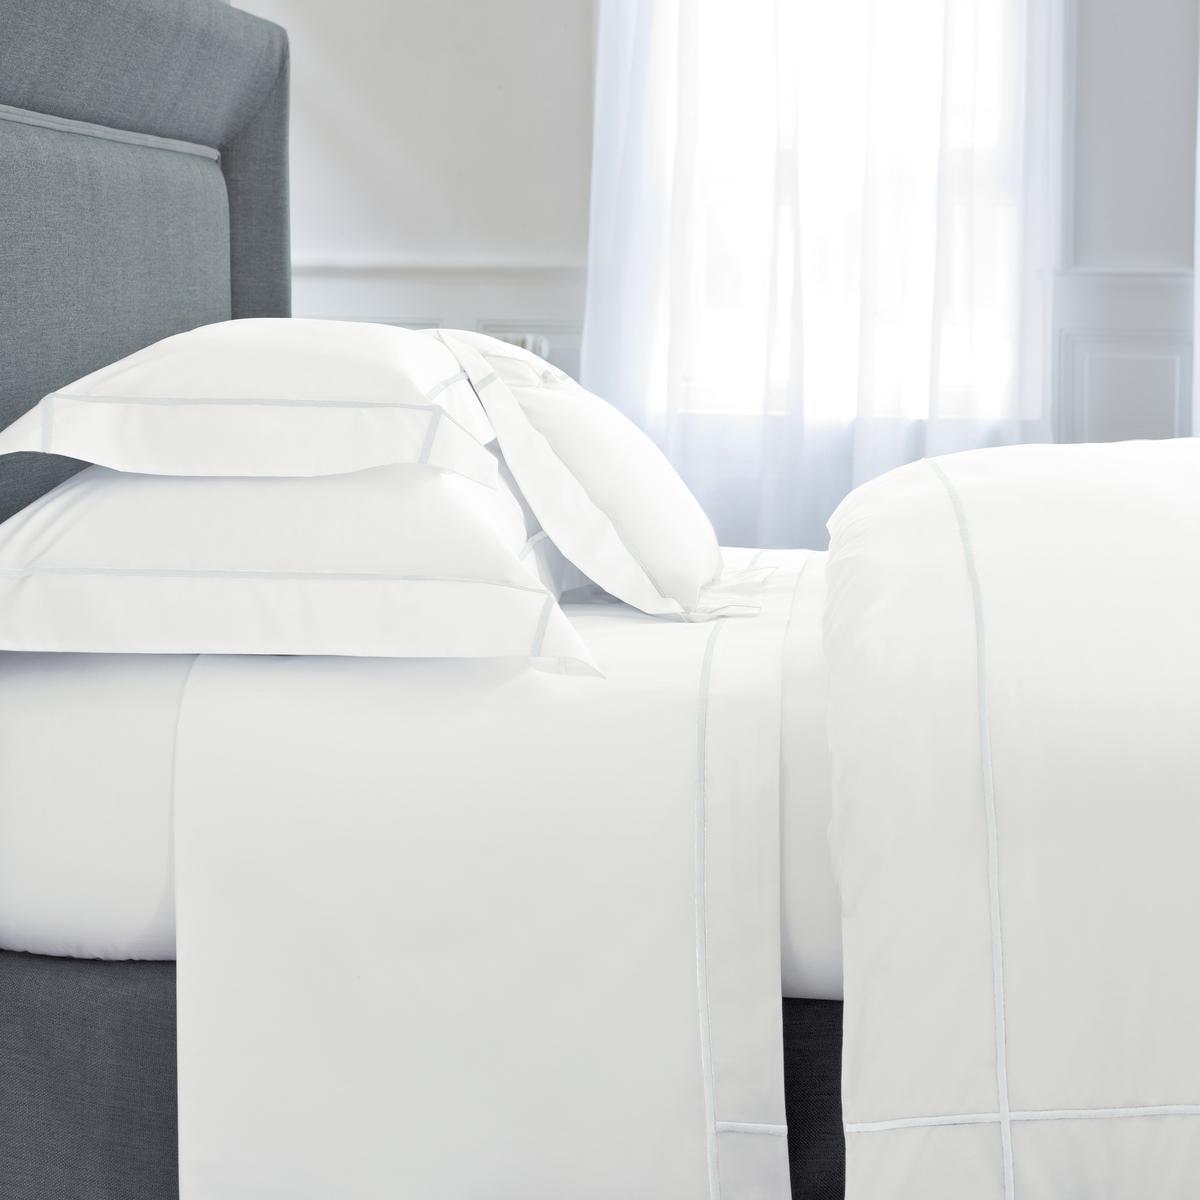 Yves Delorme Athena Bed Linen Artedona Com